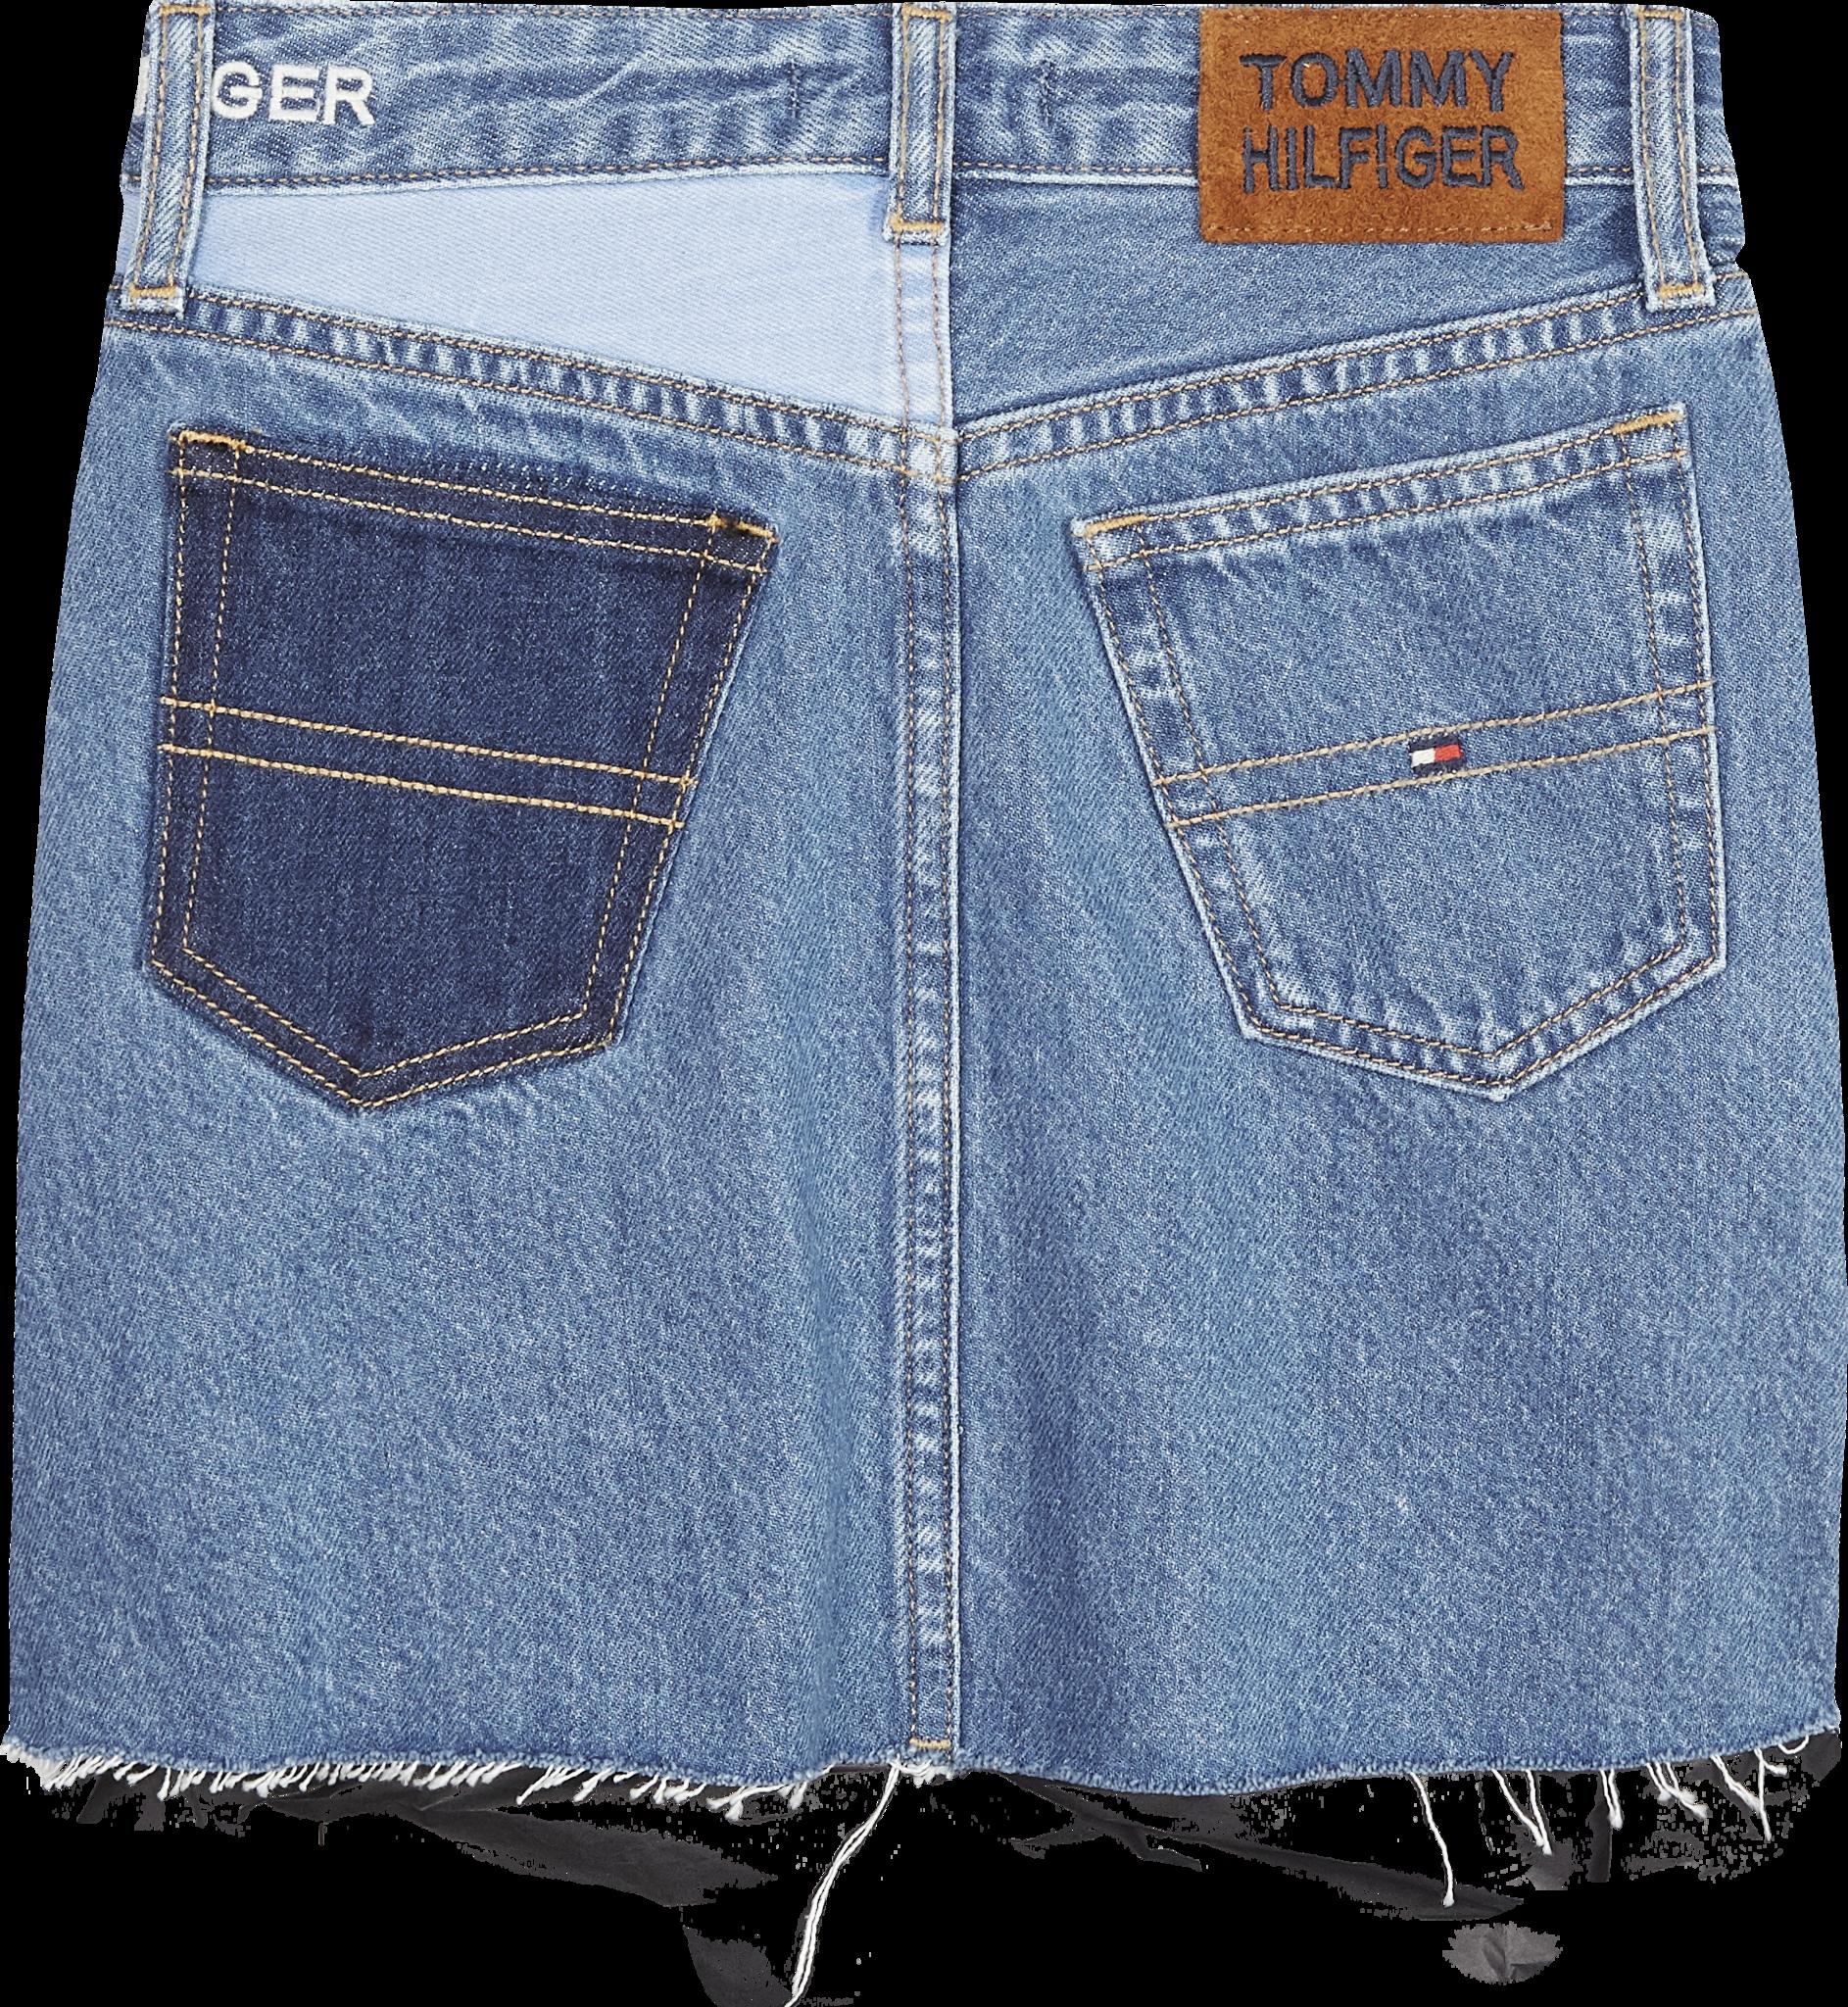 Tommy Hilfiger A-Line Skirt